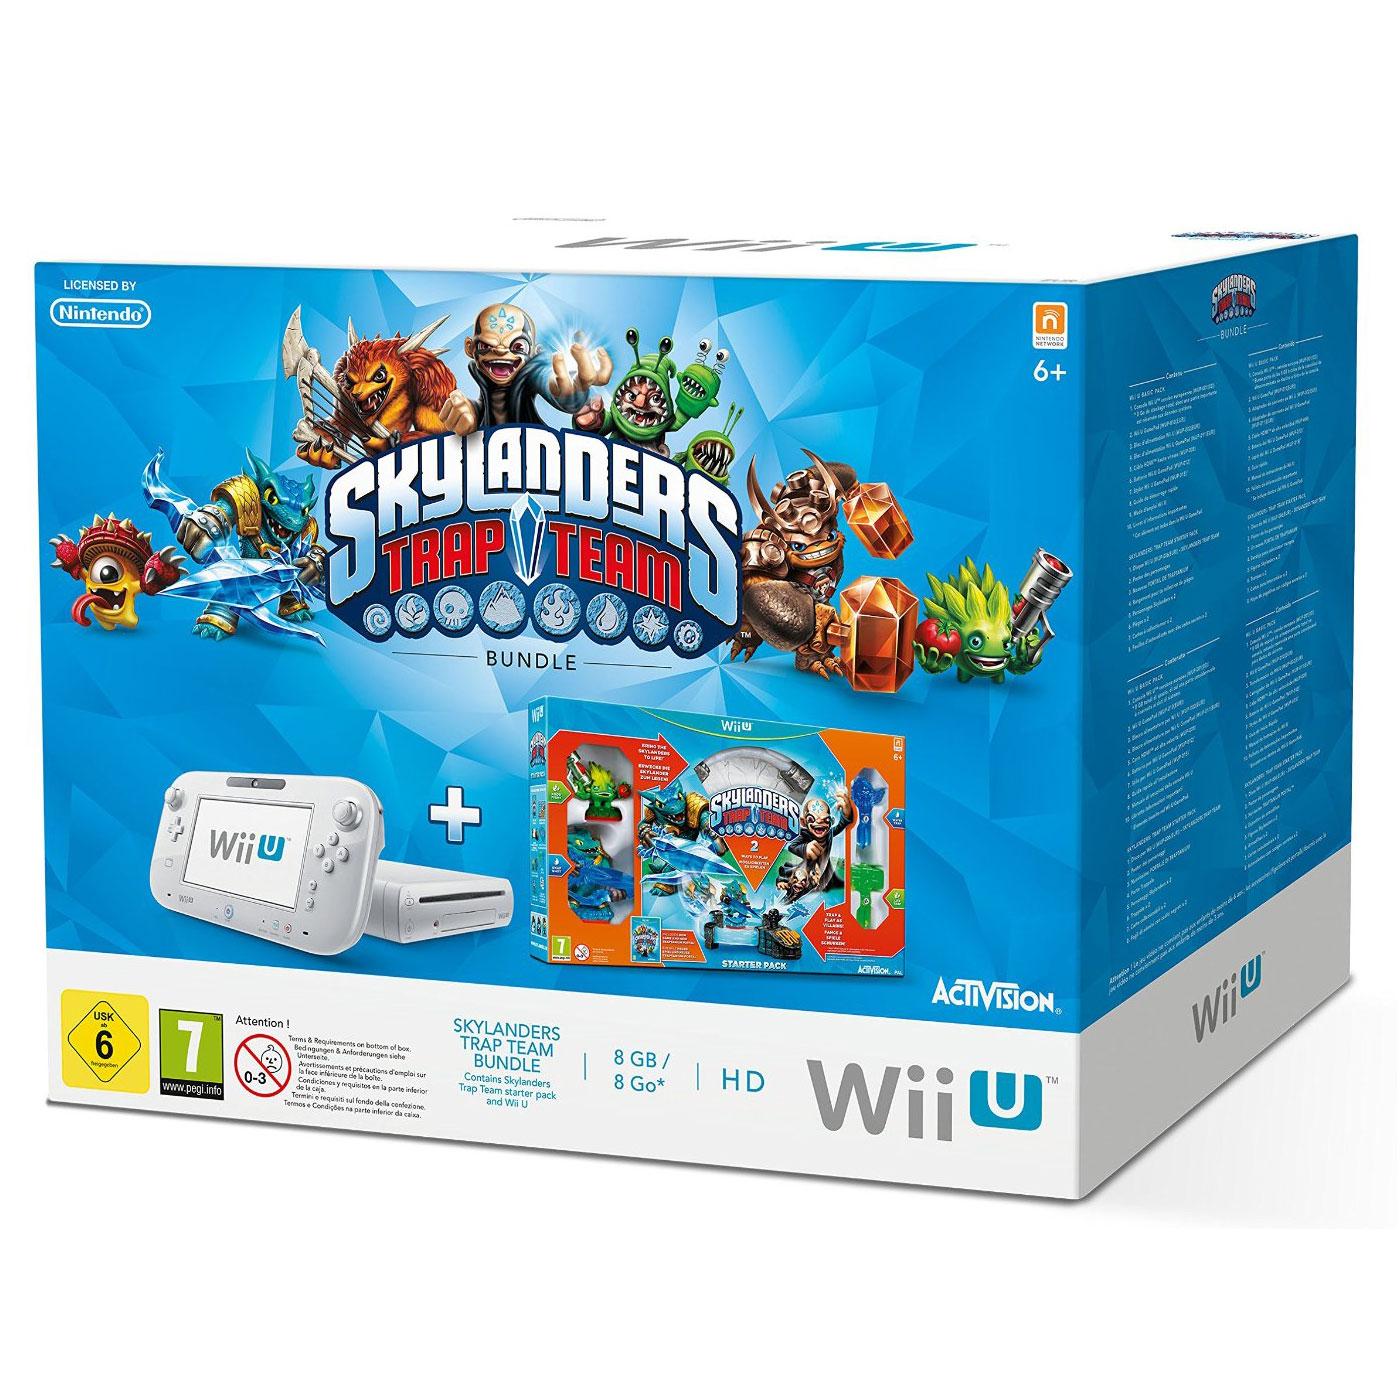 Pack Console Nintendo Wii U Basic + Pack de démarrage Skylanders Trap Team